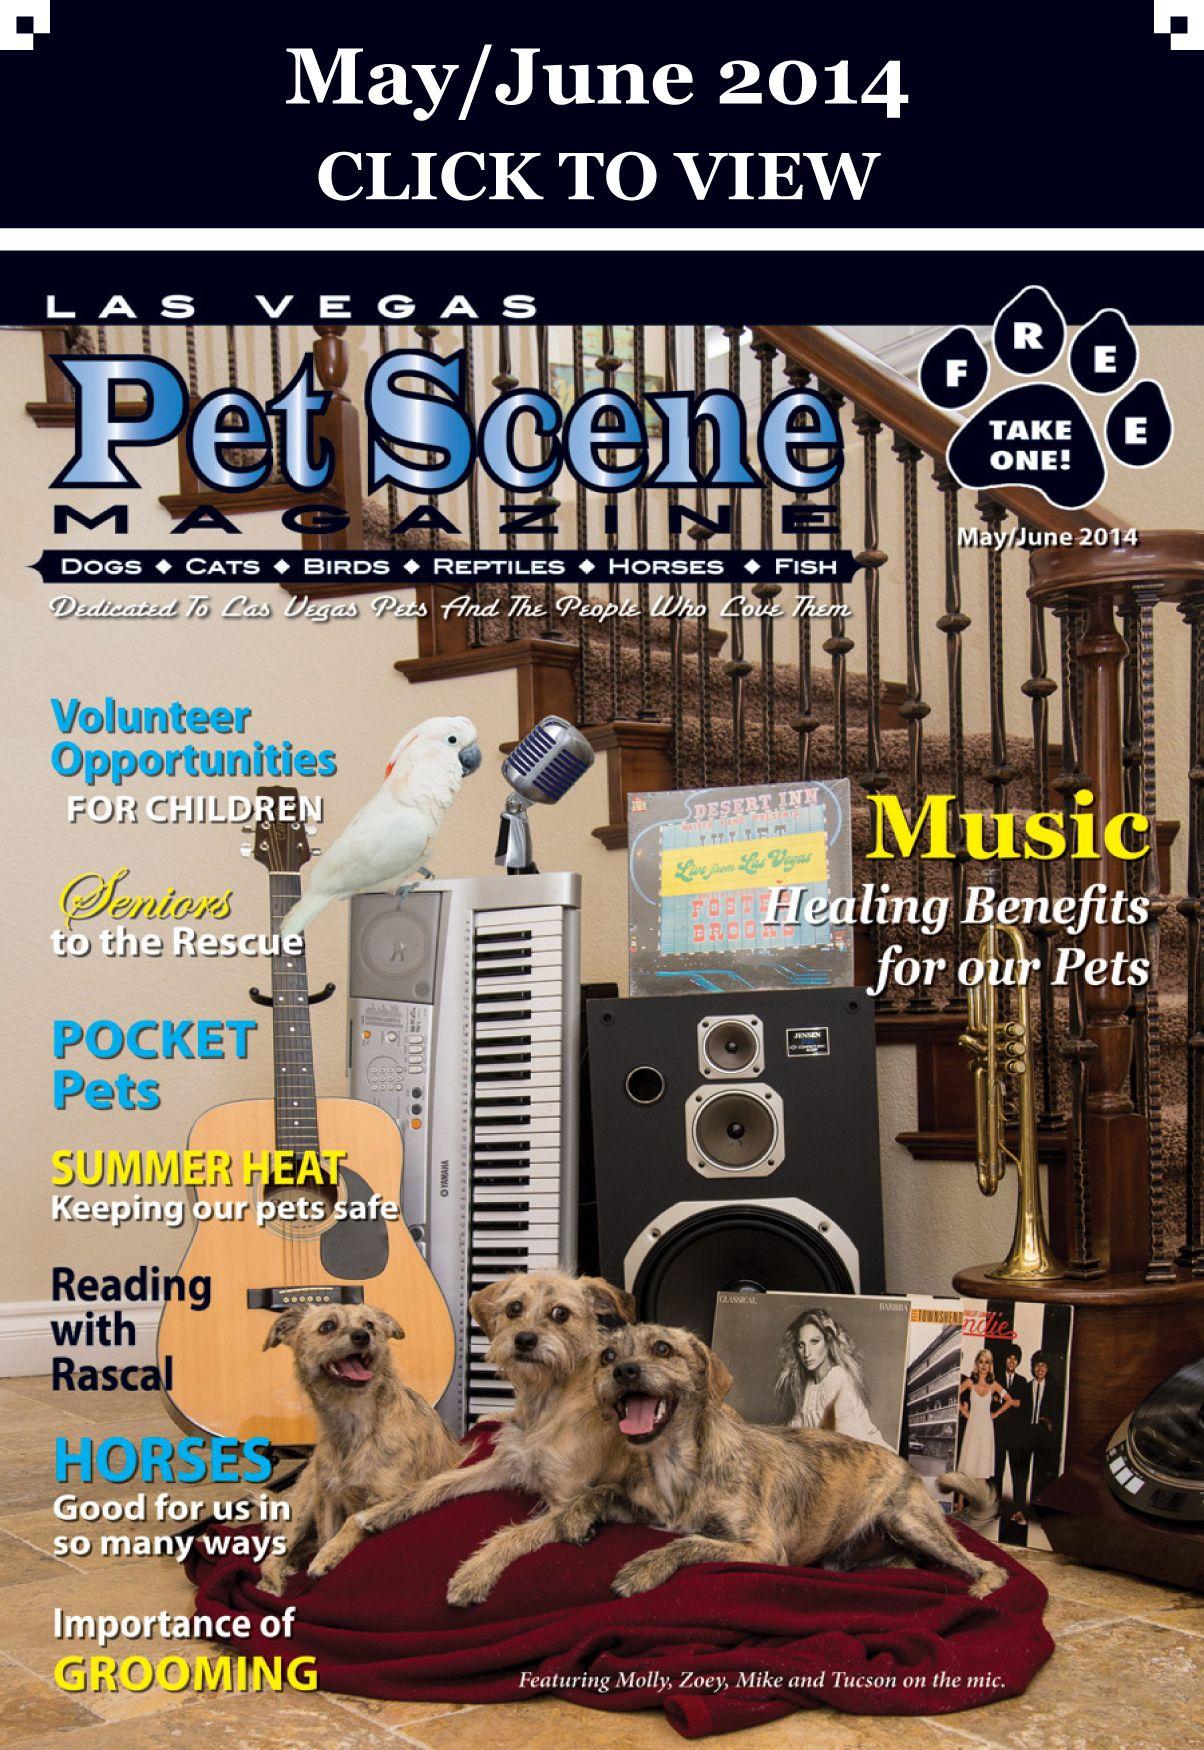 Las Vegas Pet Scene Magazine May/June 2014 Pocket pet